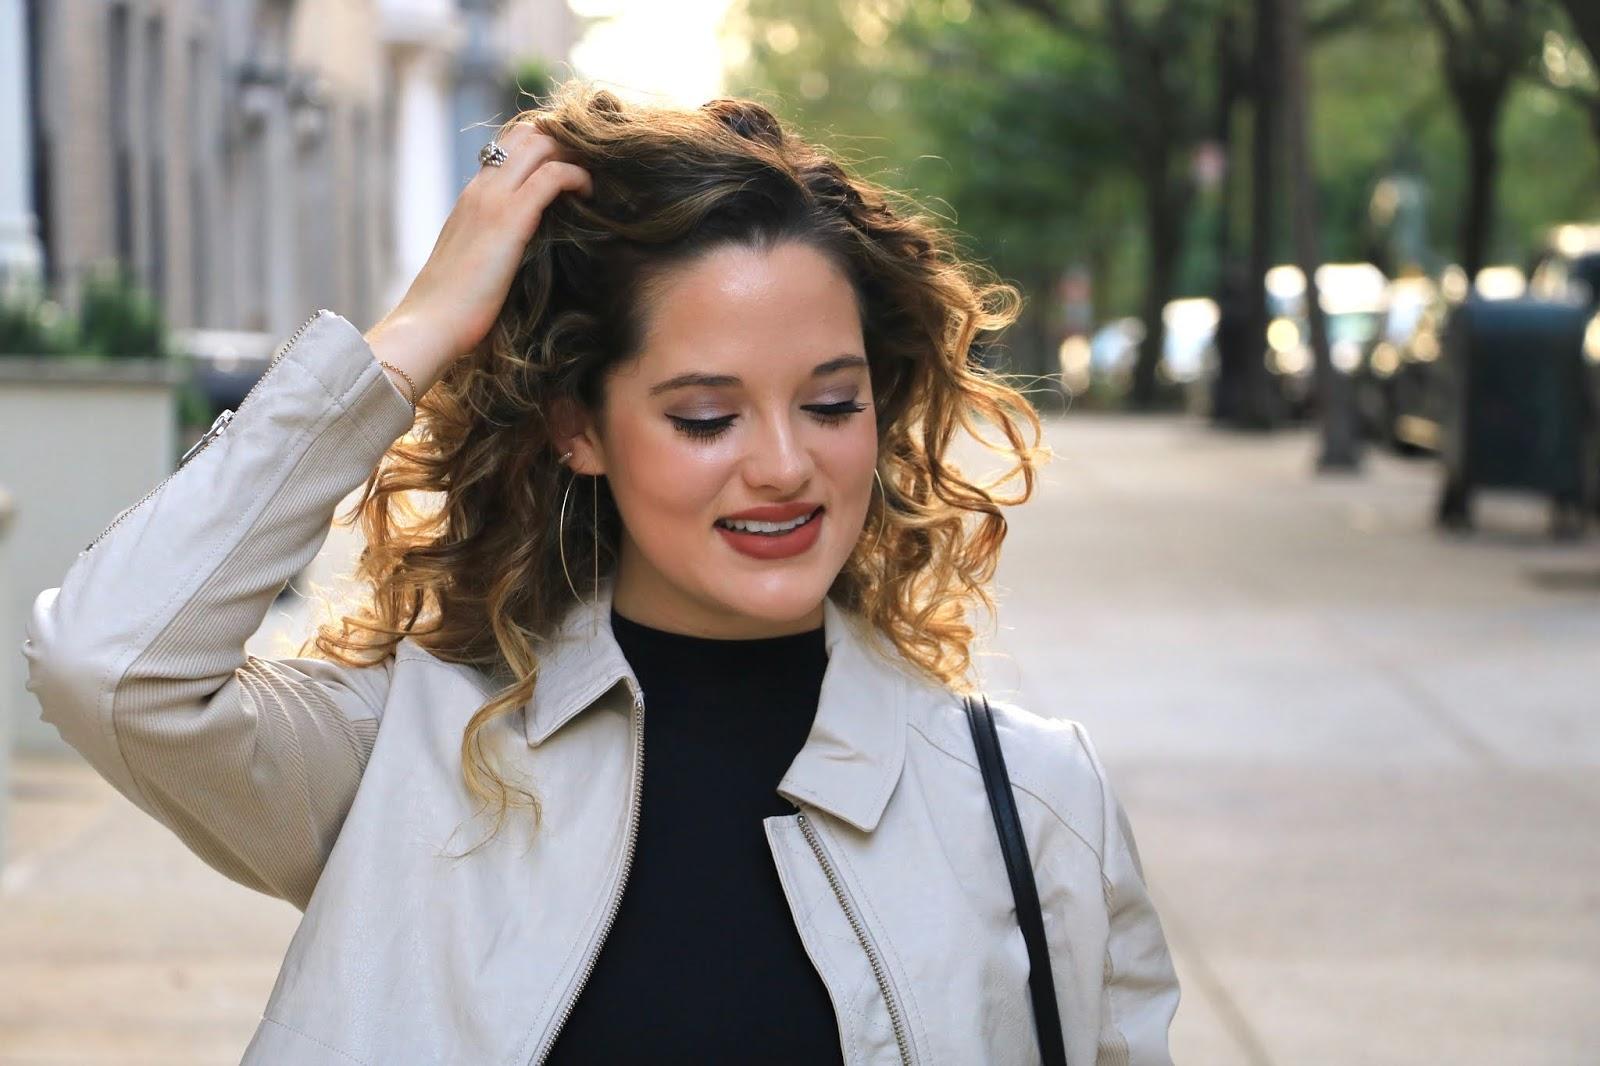 Nyc fashion blogger Kathleen Harper's Fall 2019 beauty look.